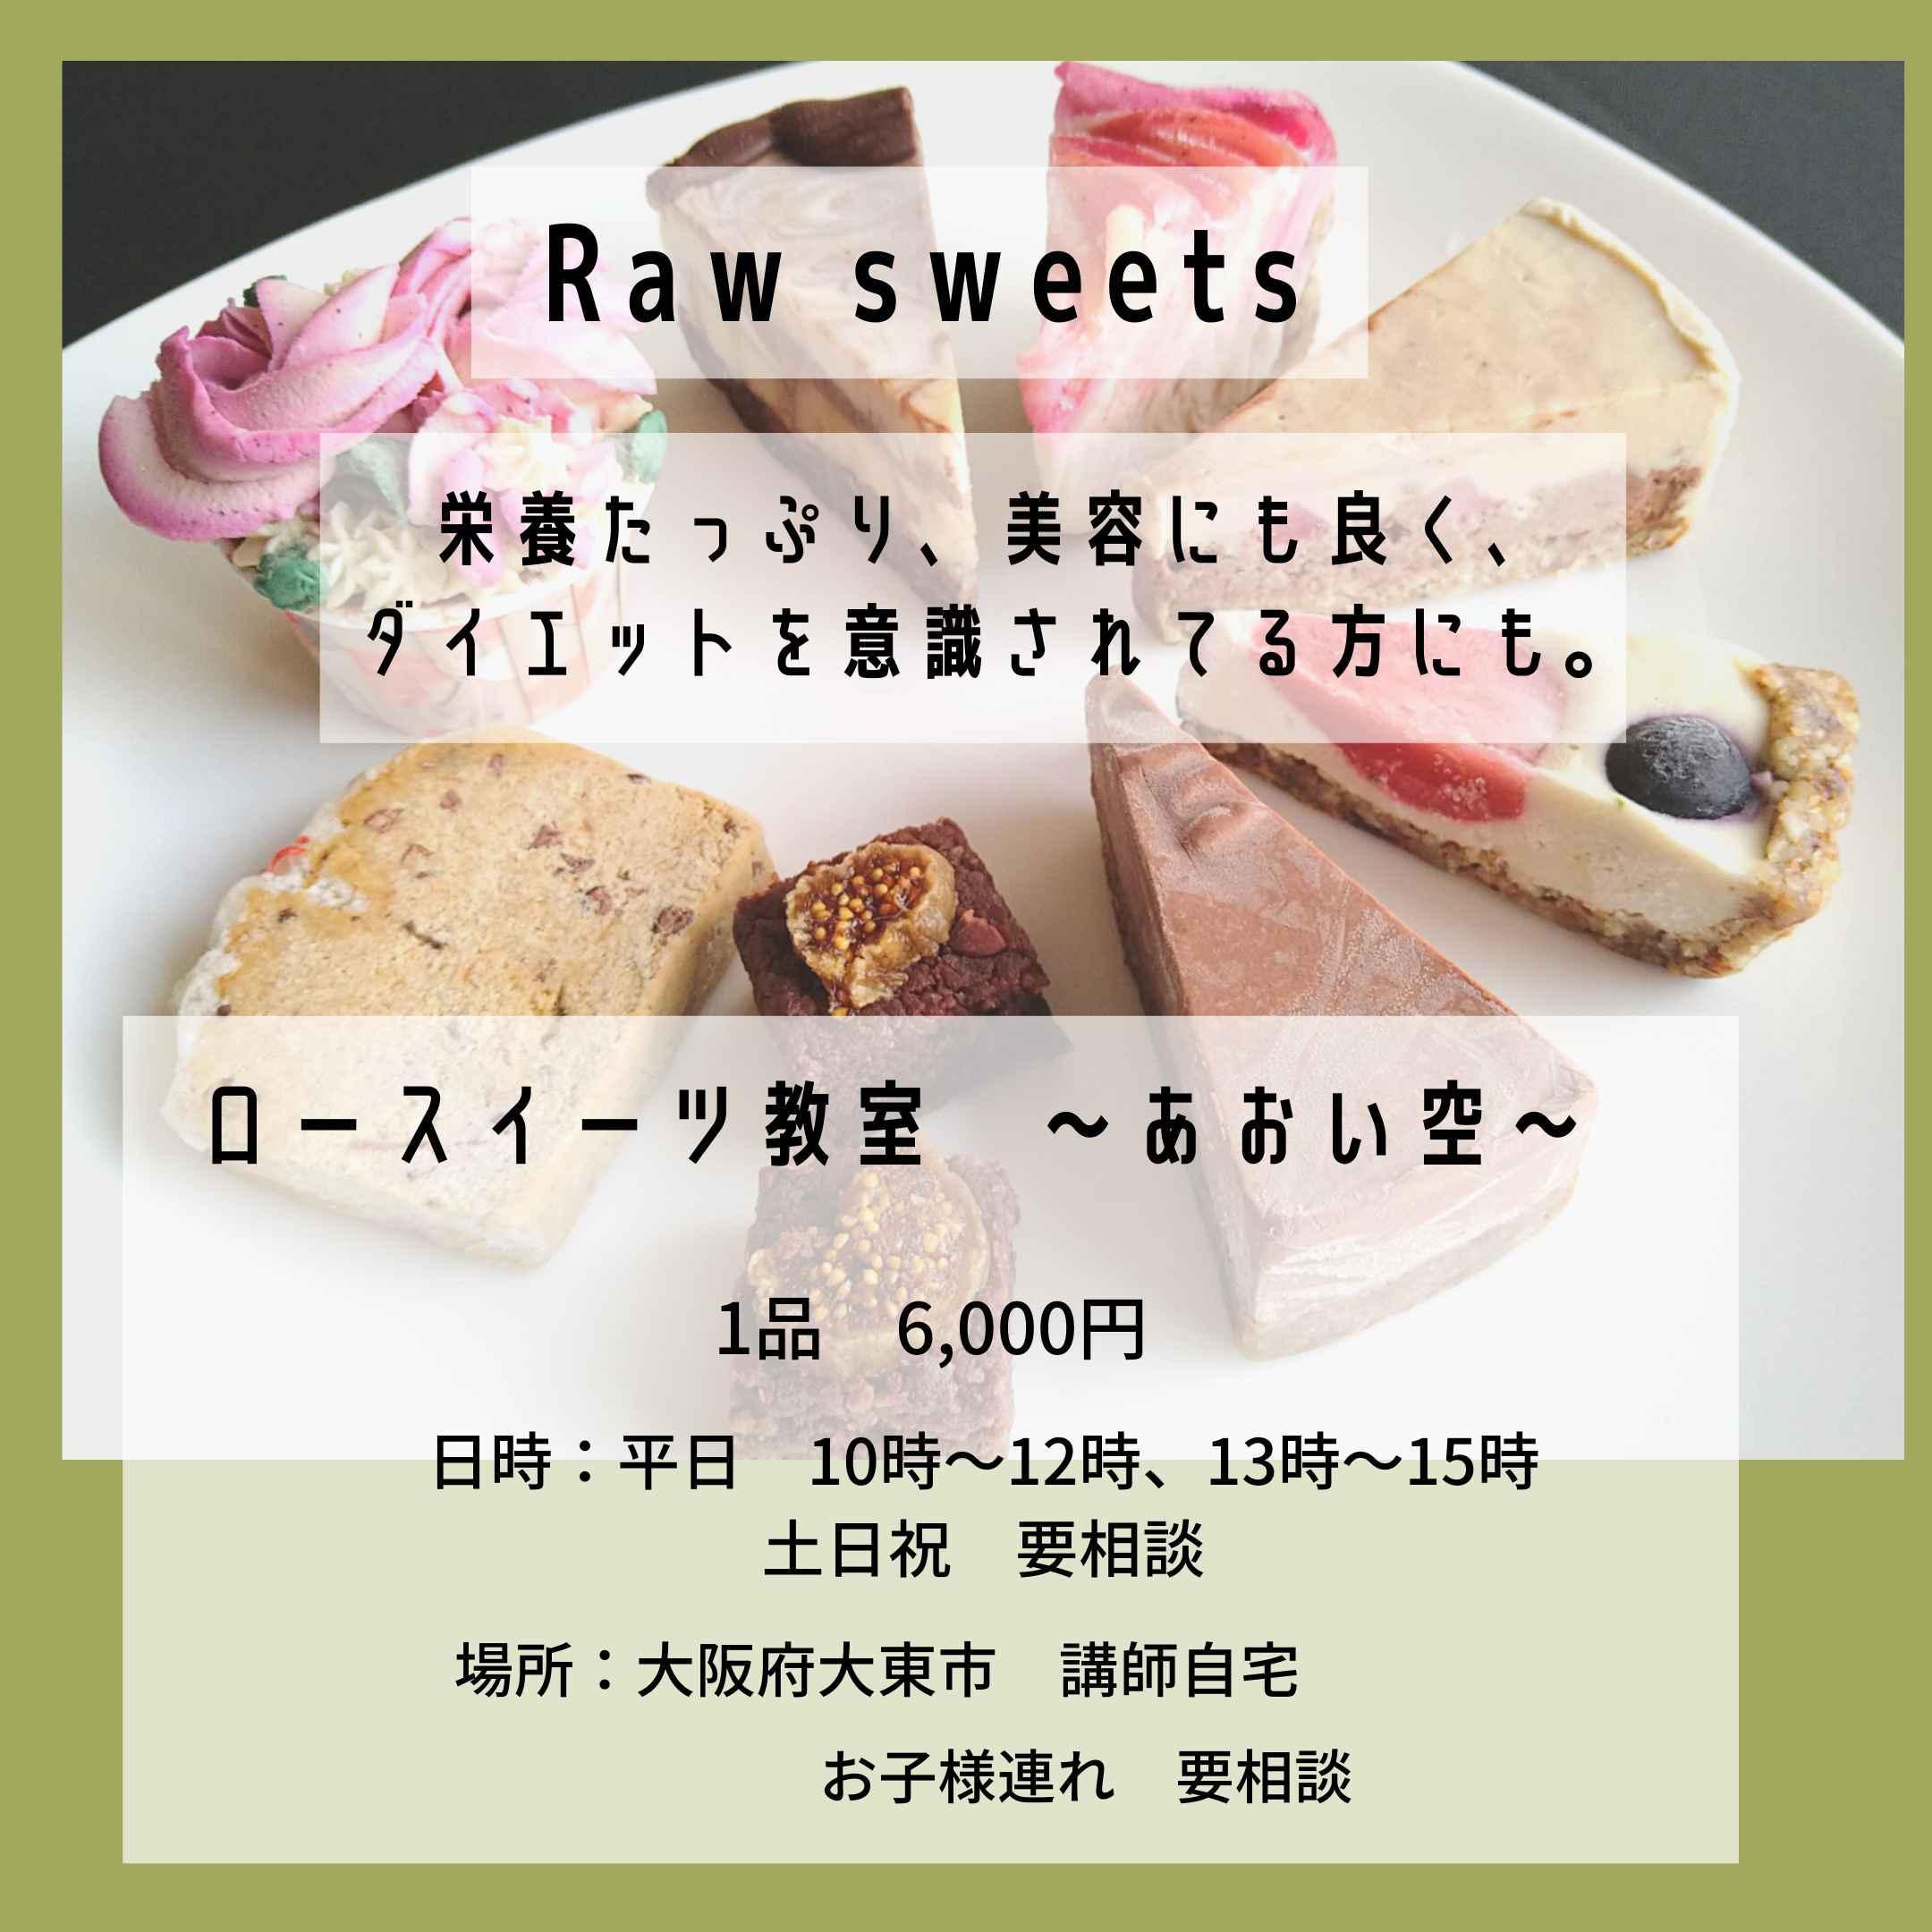 Rawsweets&米粉パン、米粉スイーツ教室 あおい空